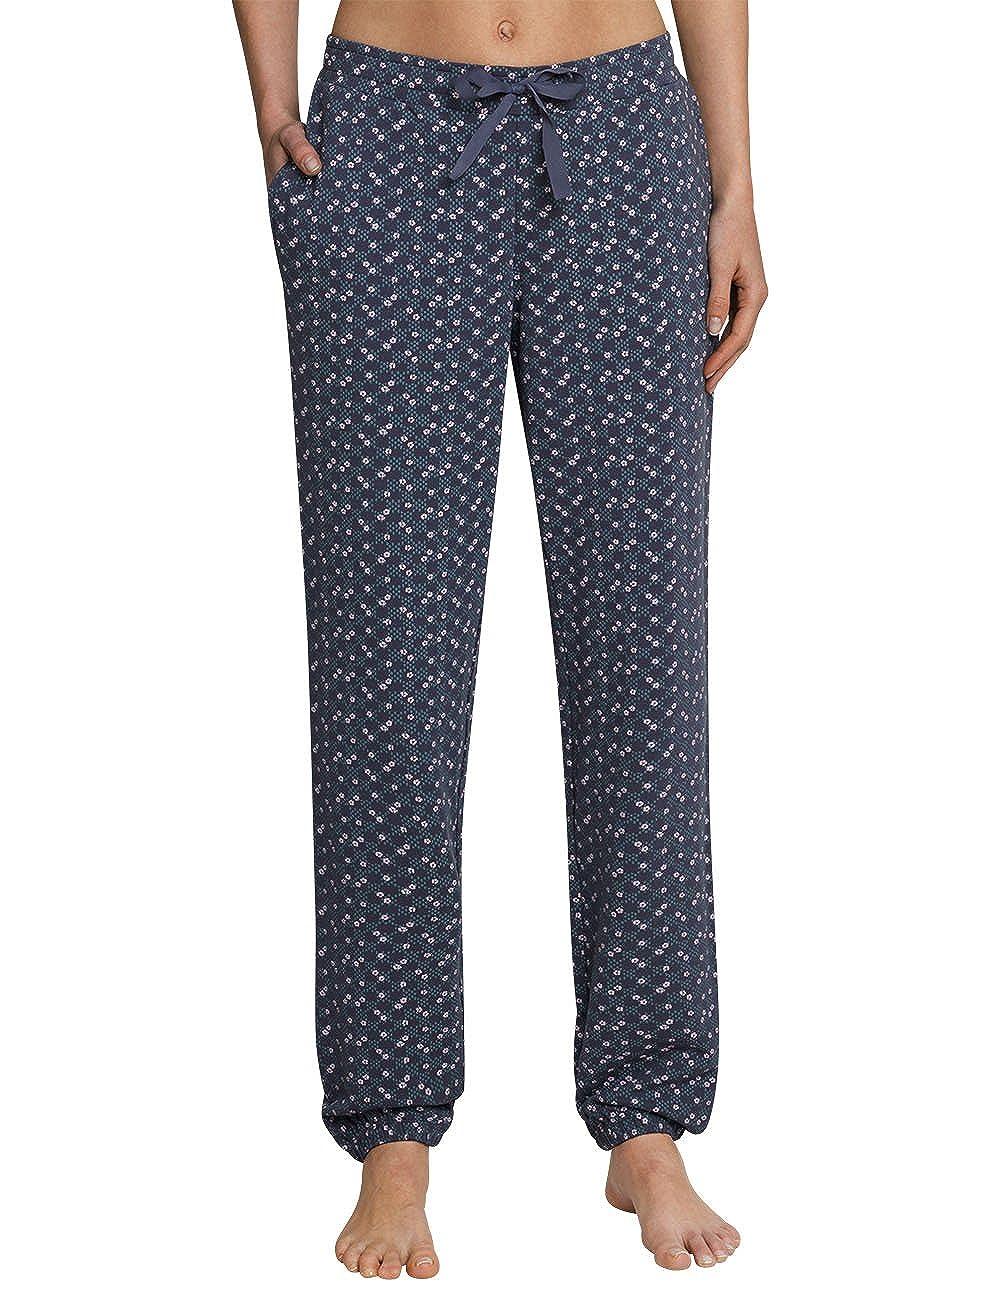 Schiesser Parte Inferior del Pijama para Mujer